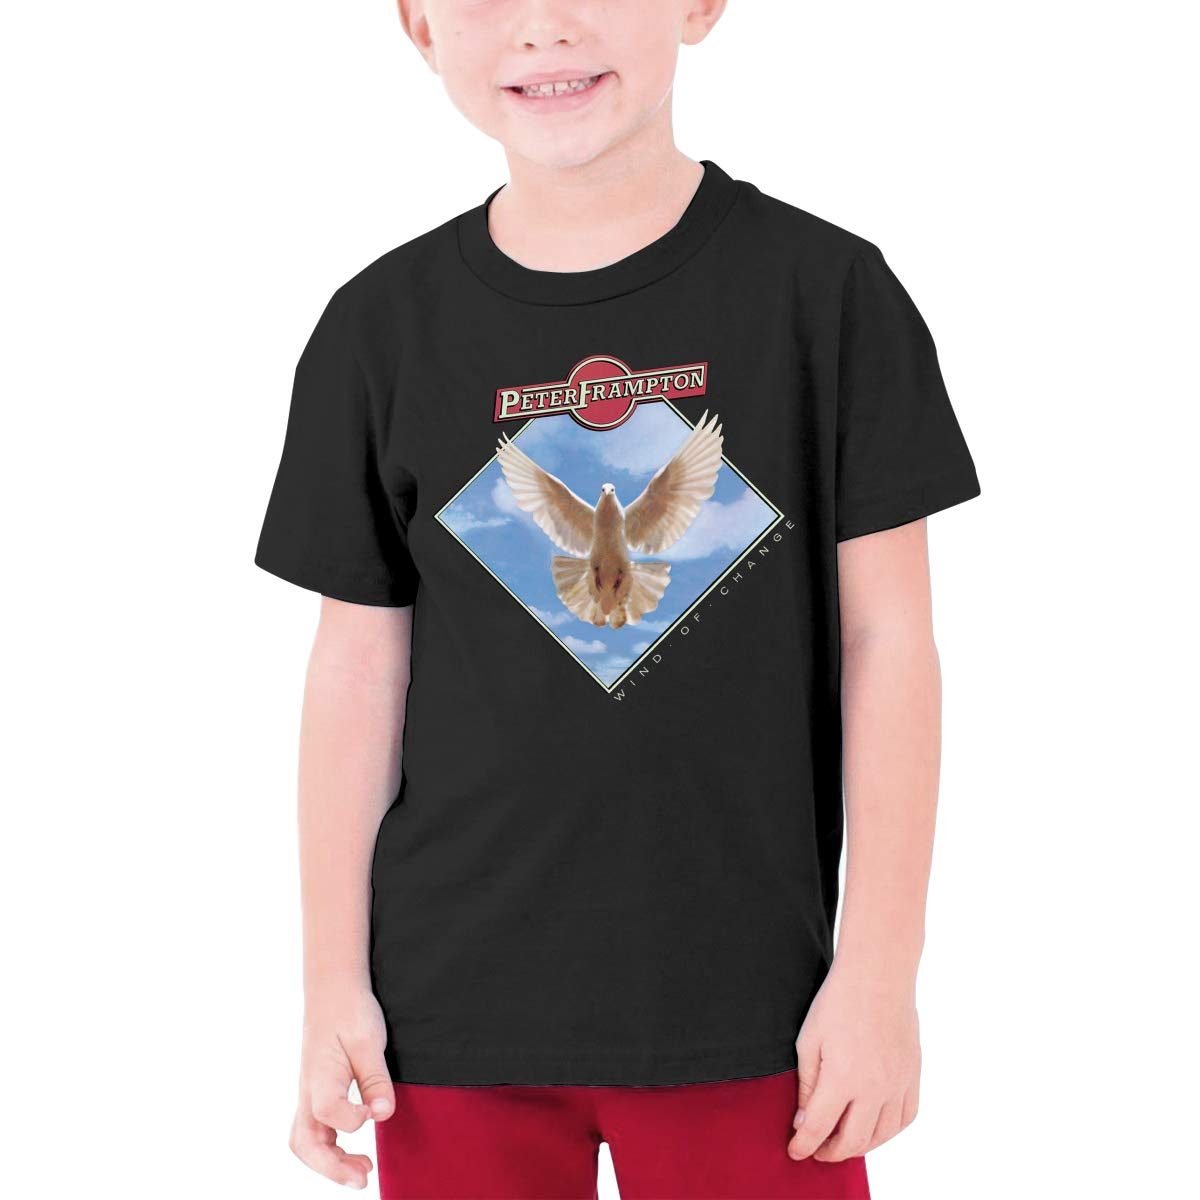 Boys Peter Frampton-Wind of Change T-Shirt Childrens Short Sleeve Shirt